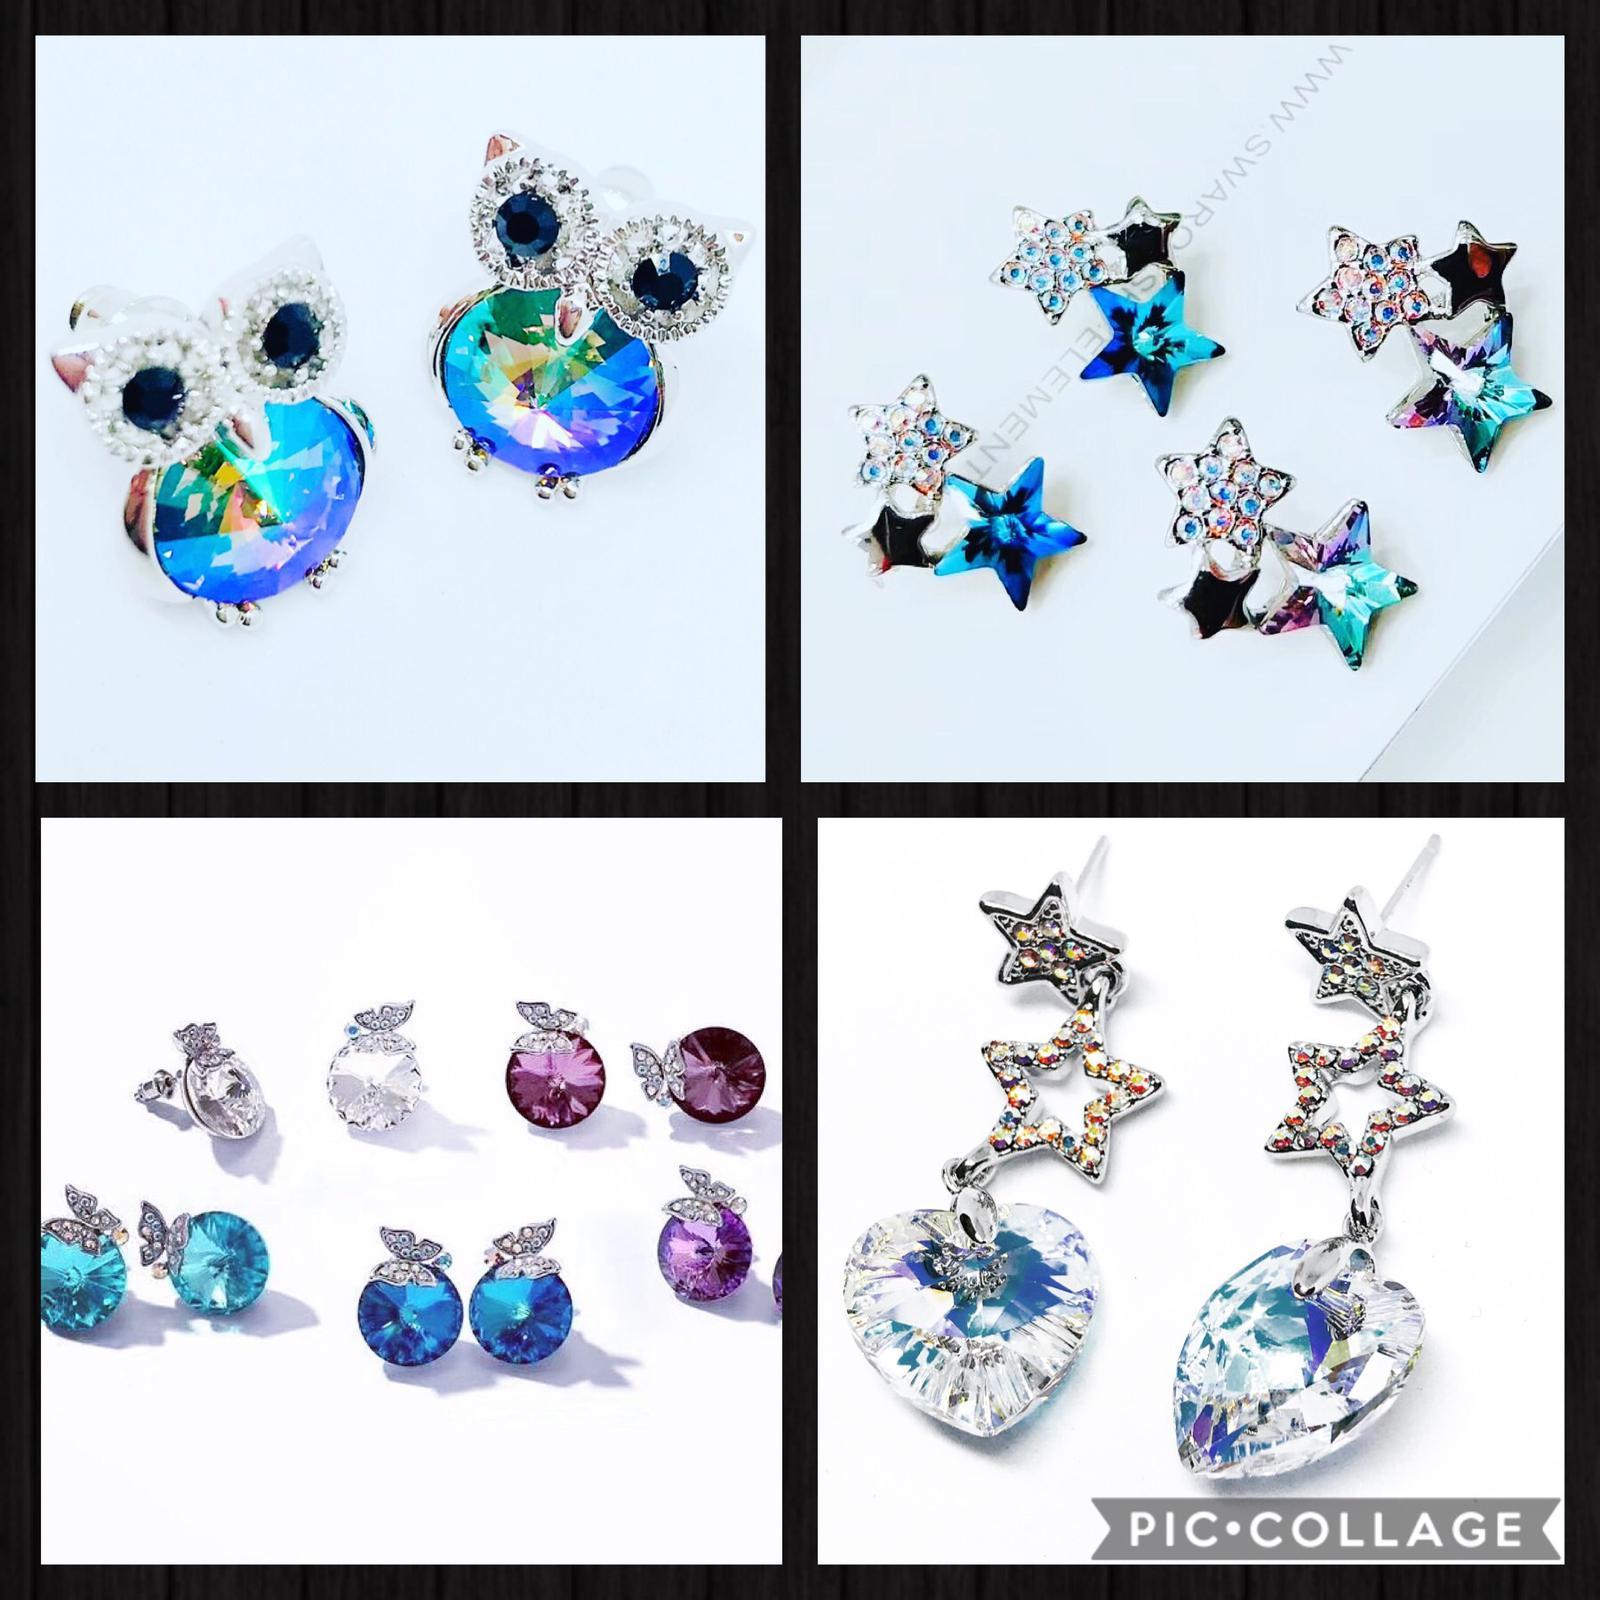 Aine - Hypoallergenic Handmade jewellery - Perth Makers Market